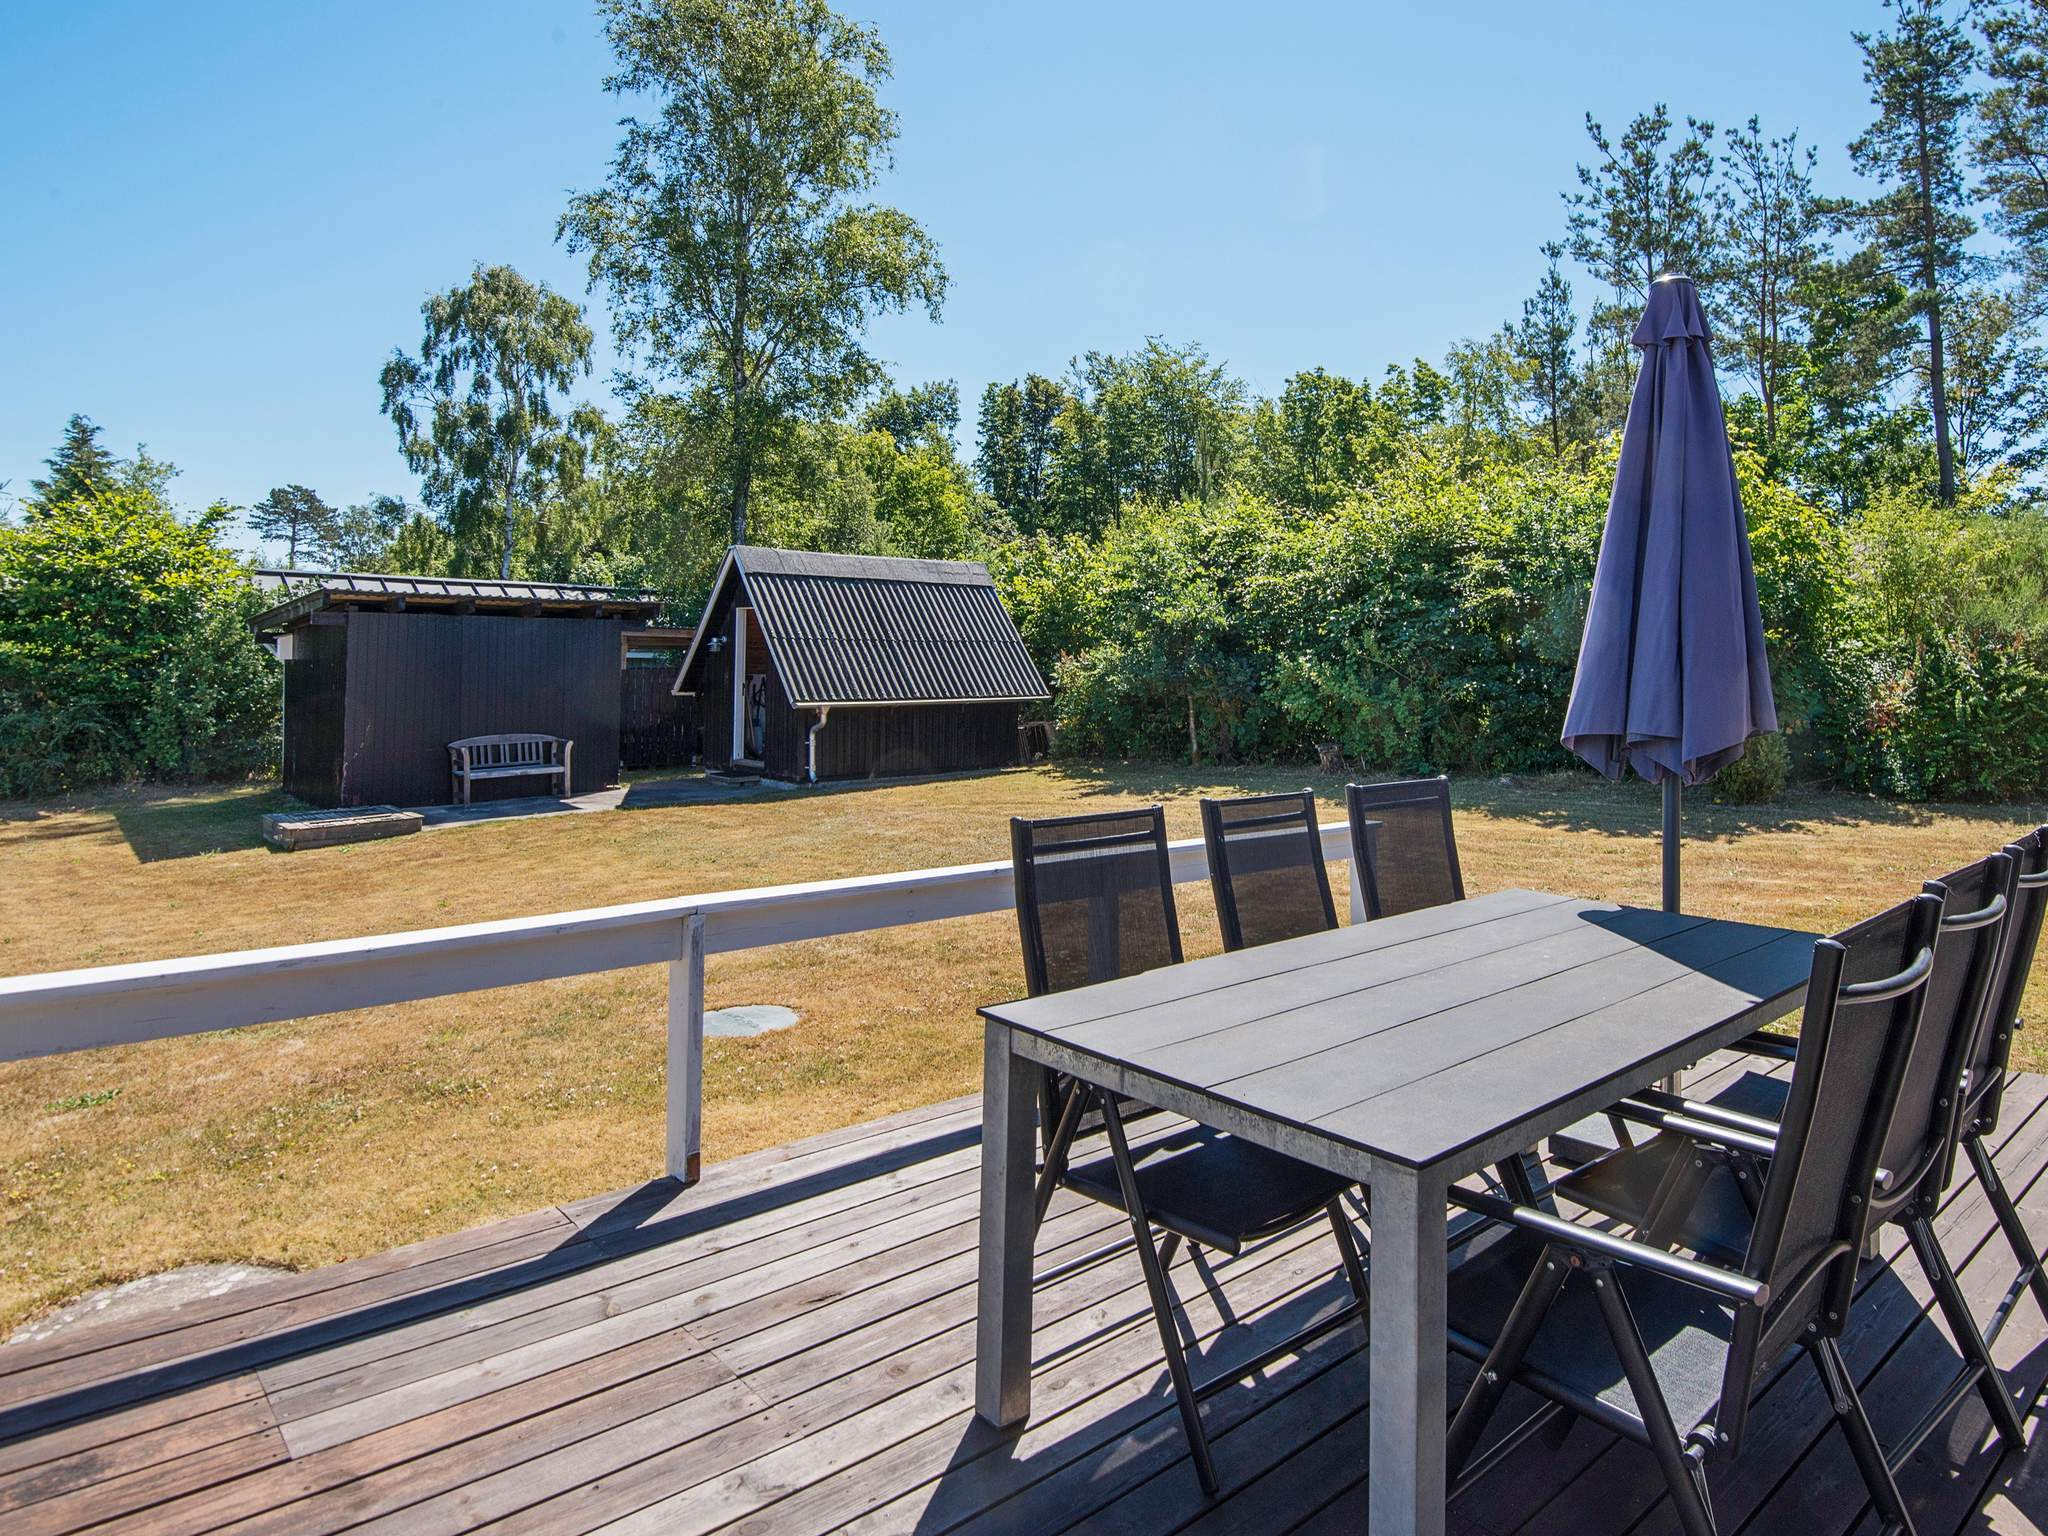 Maison de vacances Helgenæs (978615), Knebel, , Jutland Est, Danemark, image 18